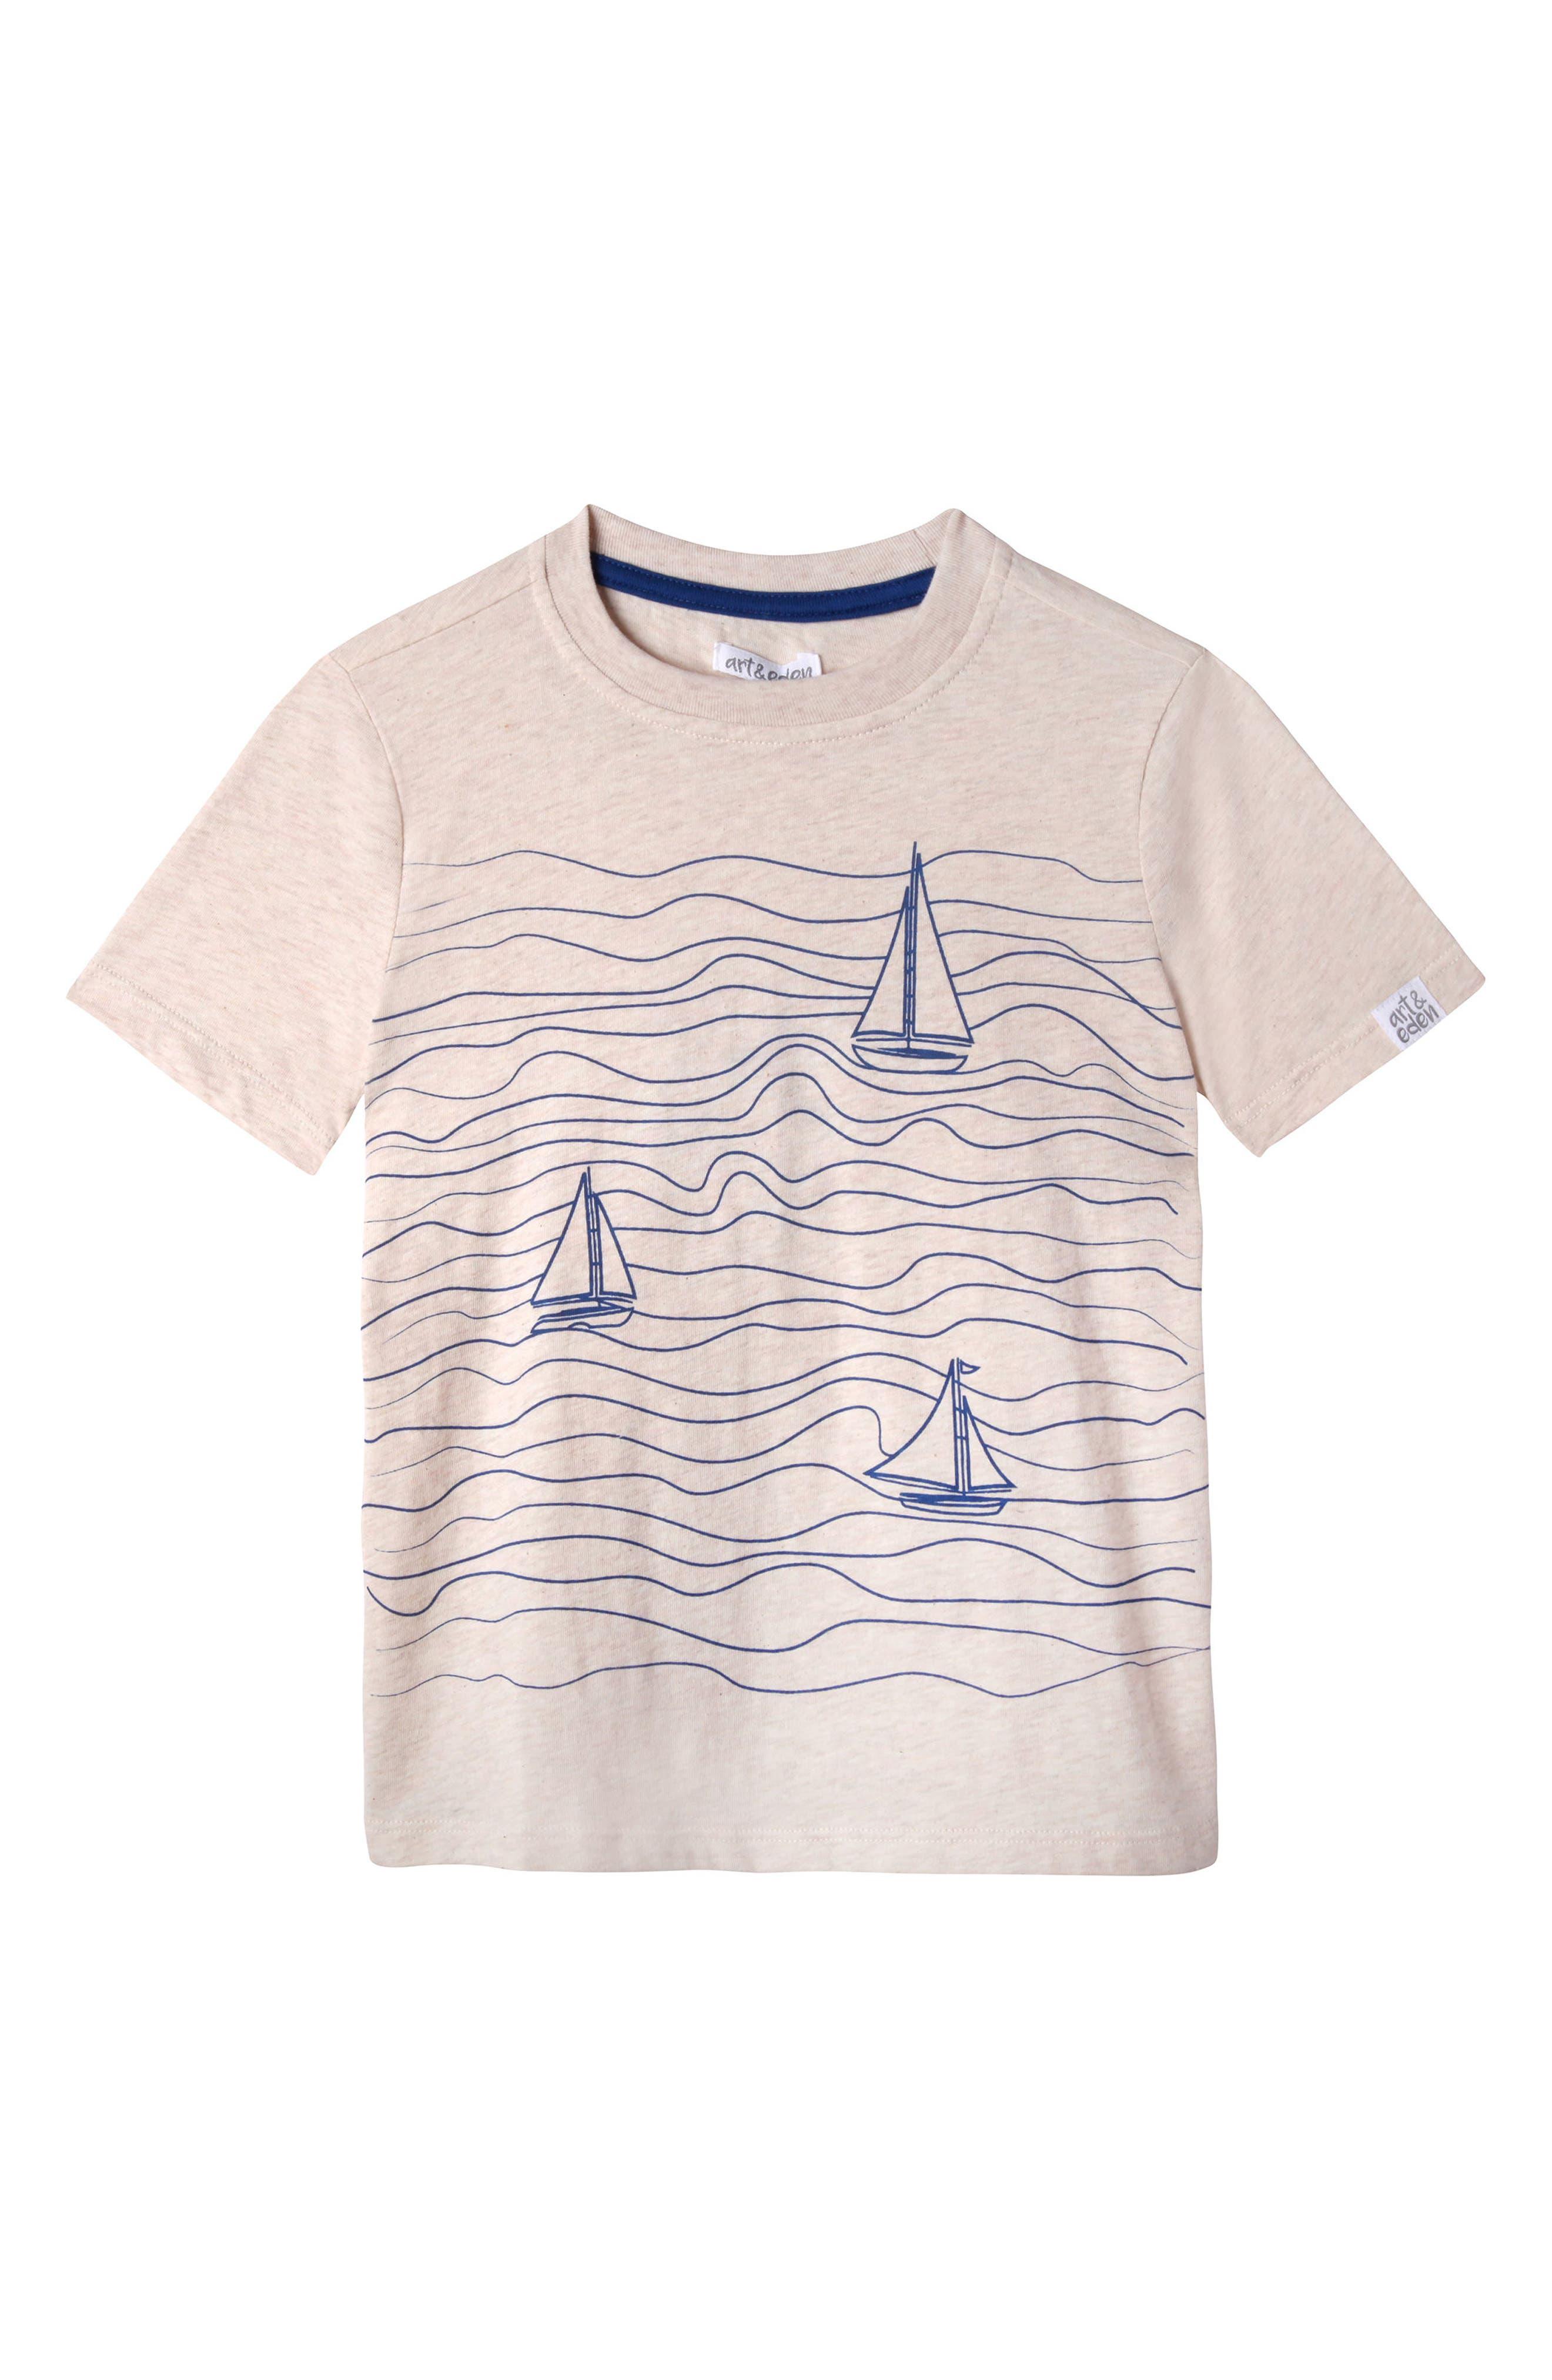 Jacob Sailboat Organic Cotton T-Shirt,                             Main thumbnail 1, color,                             260